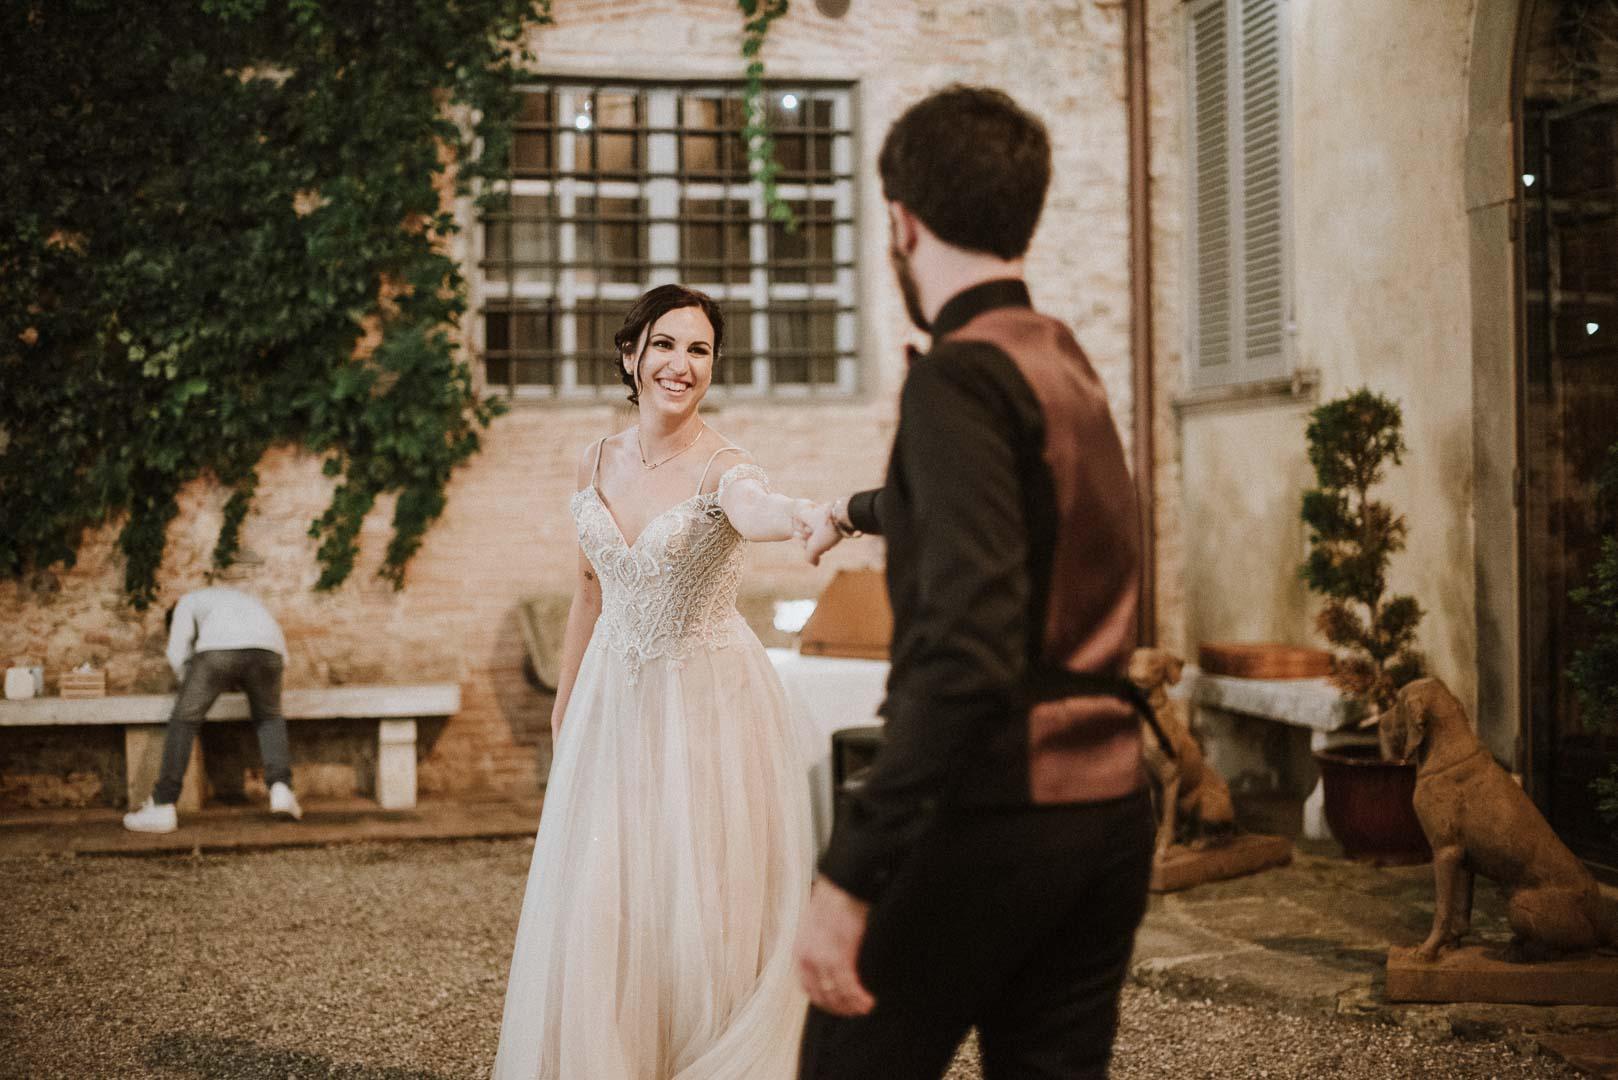 wedding-photographer-destination-fineart-bespoke-reportage-tuscany-villascorzi-vivianeizzo-spazio46-180